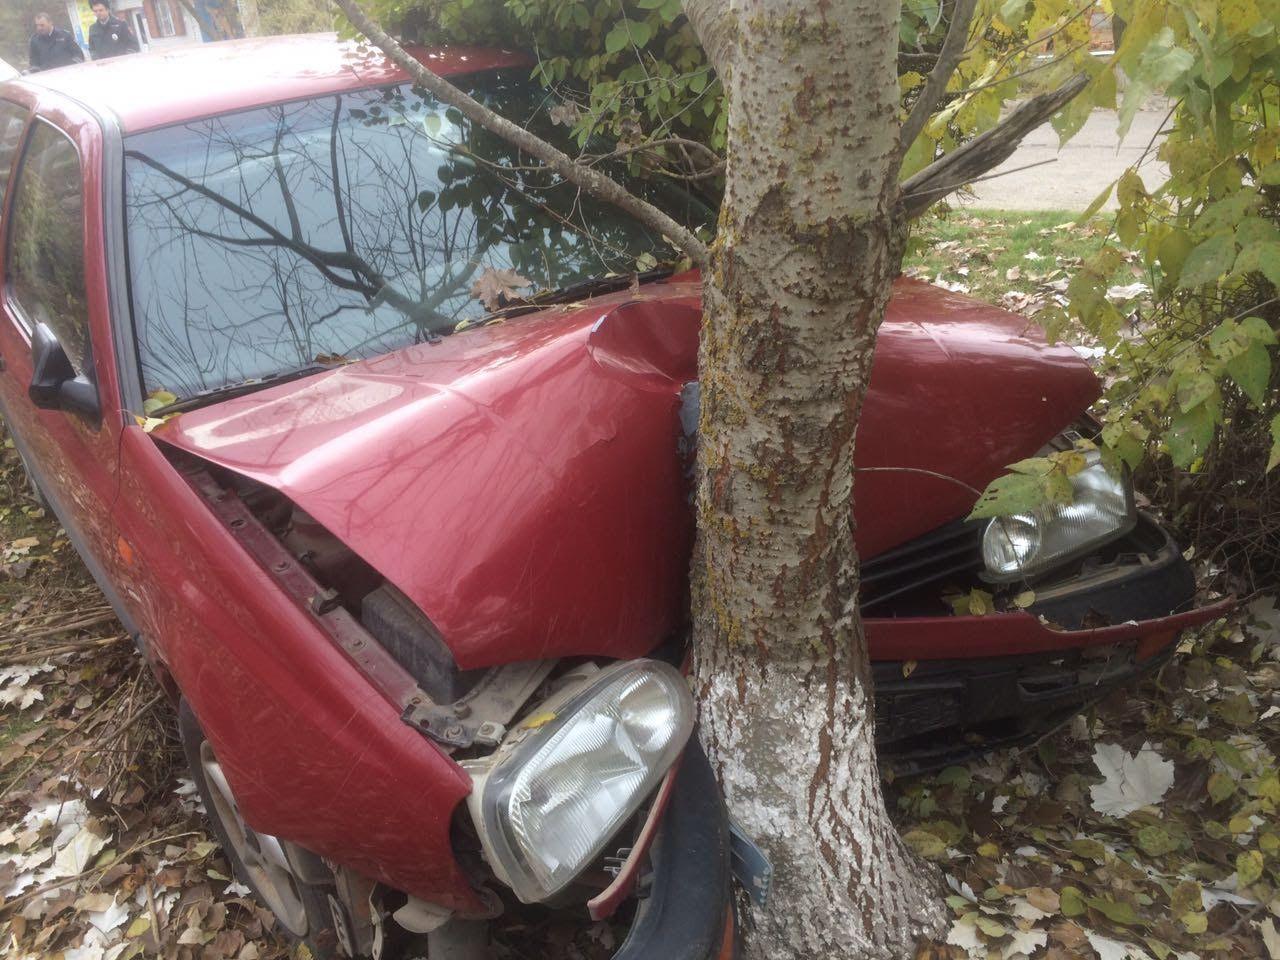 19-летний шофёр, утратив сознание, врезался вдерево наСтаврополье